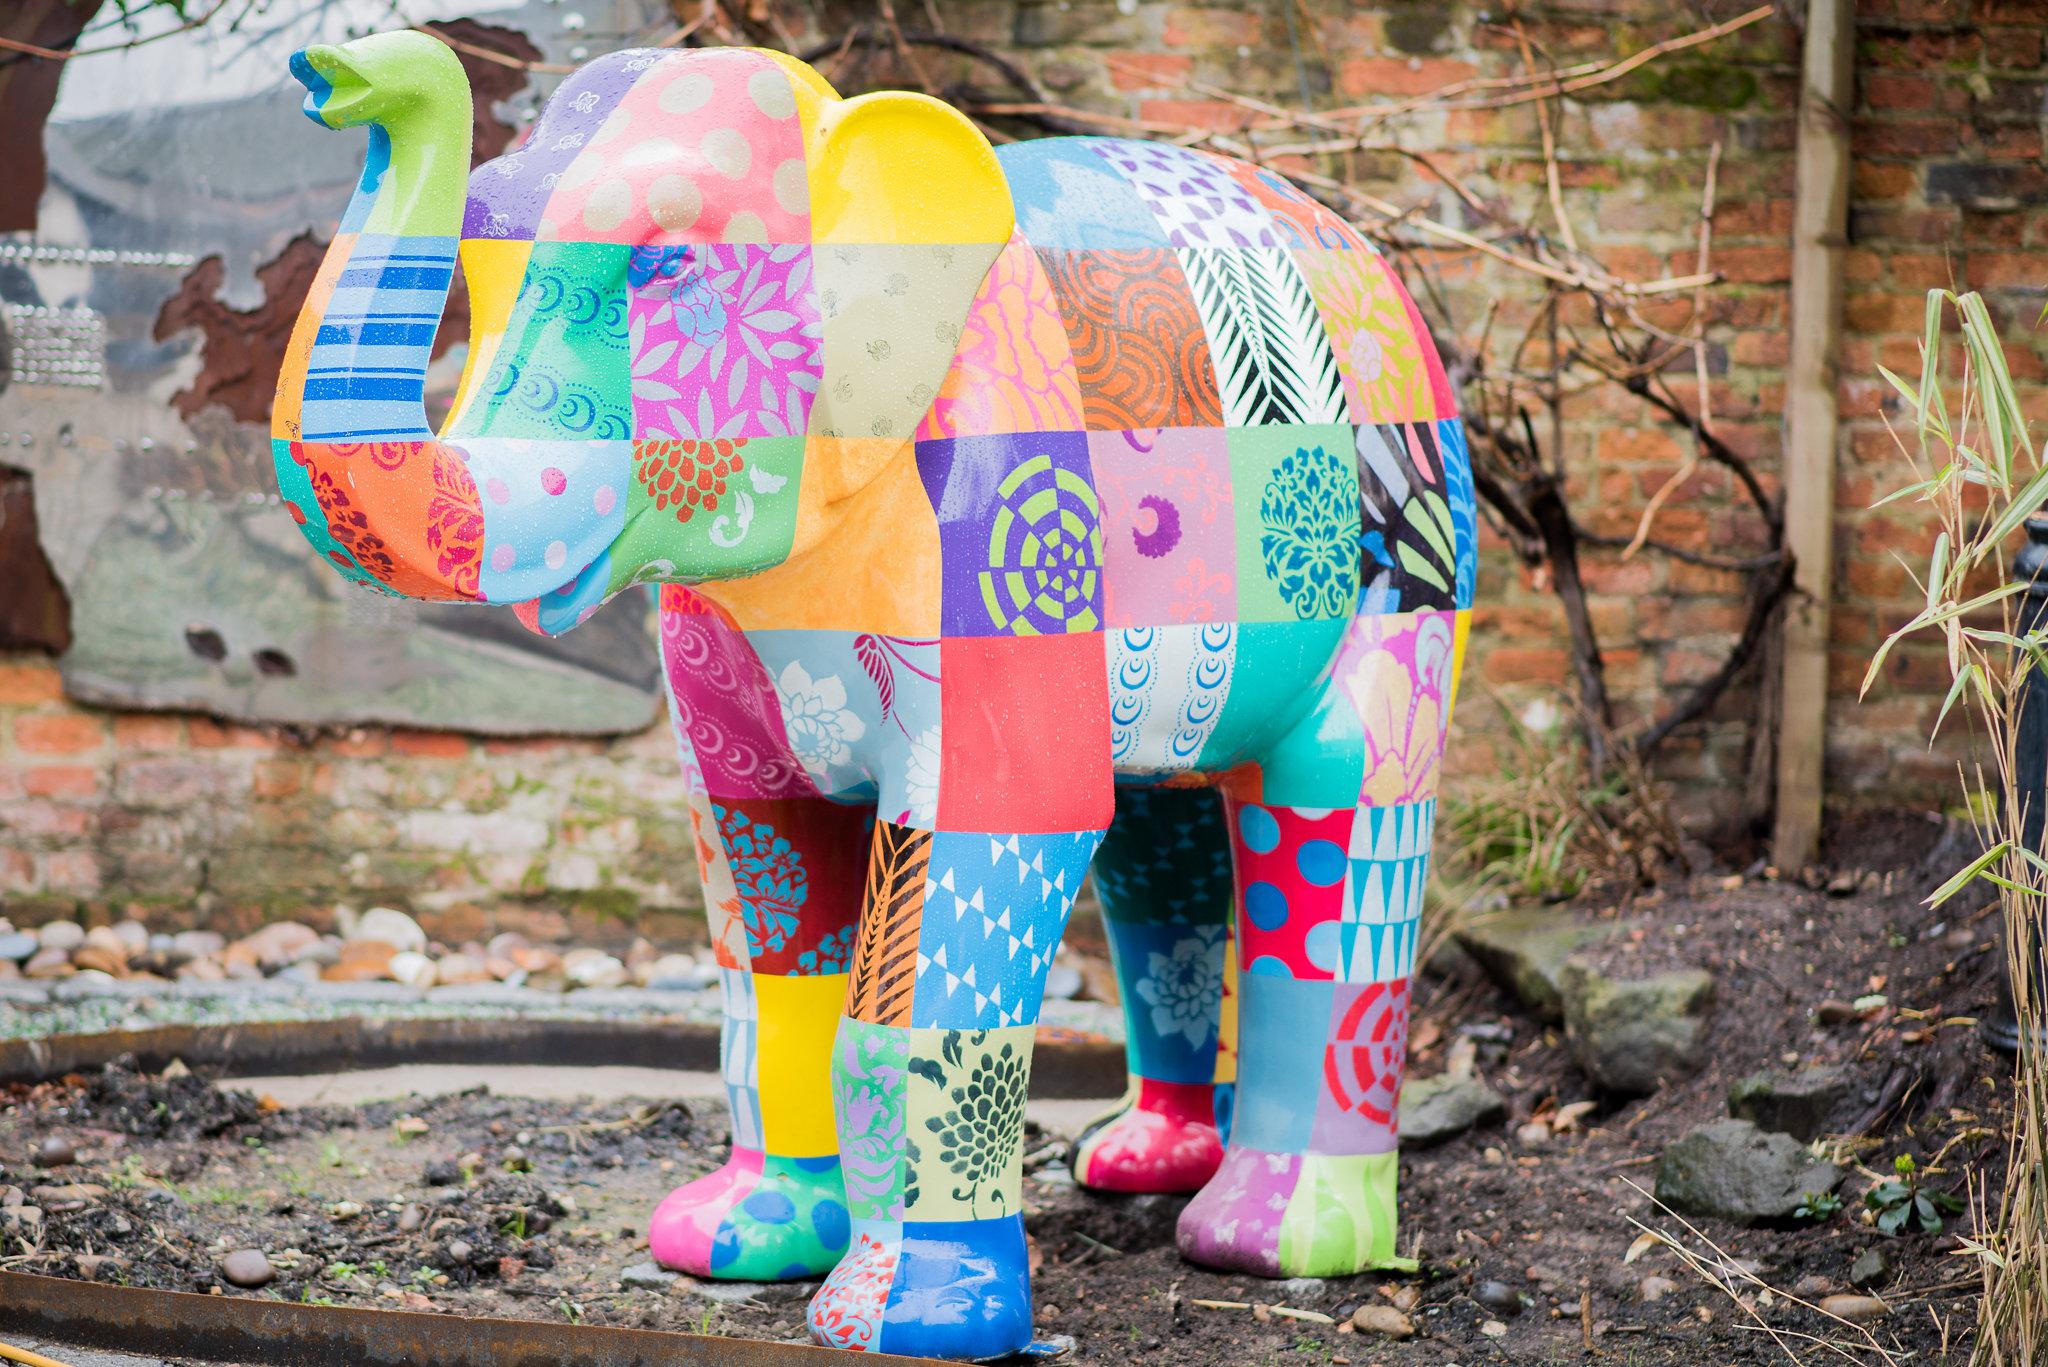 180315-ElephantRooms-43-web.jpg